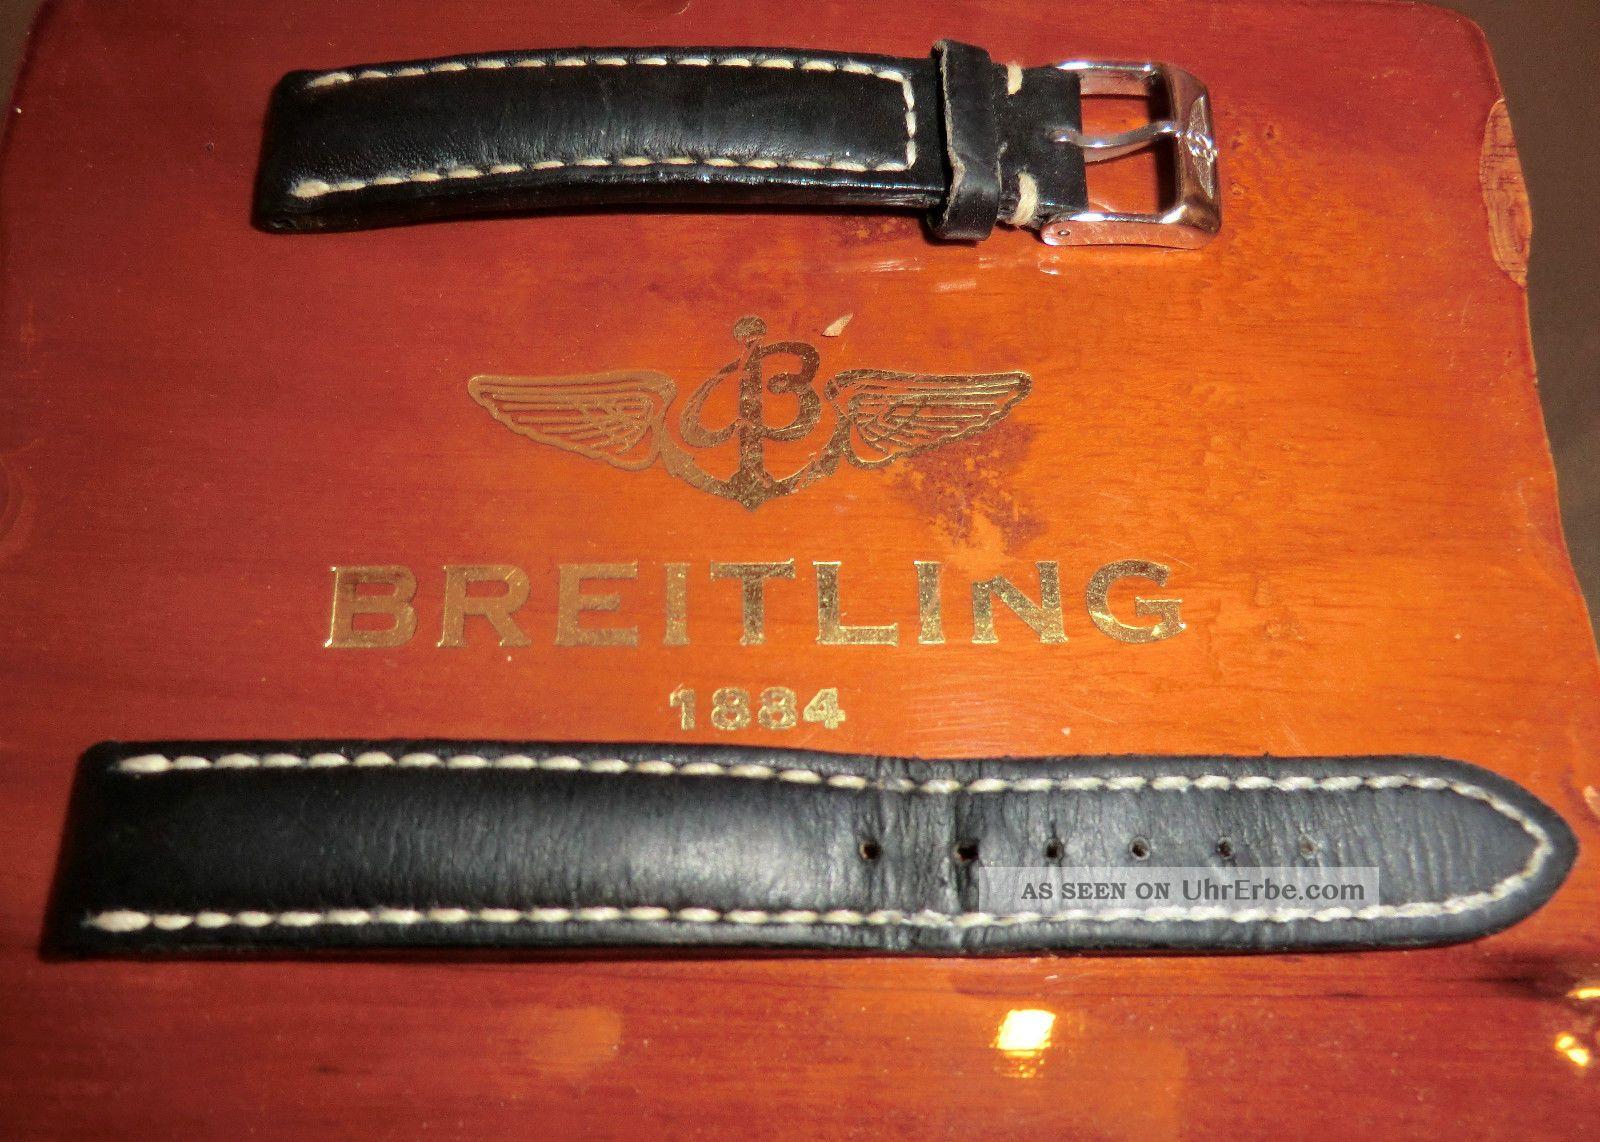 Breitling Uhrenarmband Damen 15 - 14 Mit Schließe Dunkelblau Leder Armbanduhren Bild